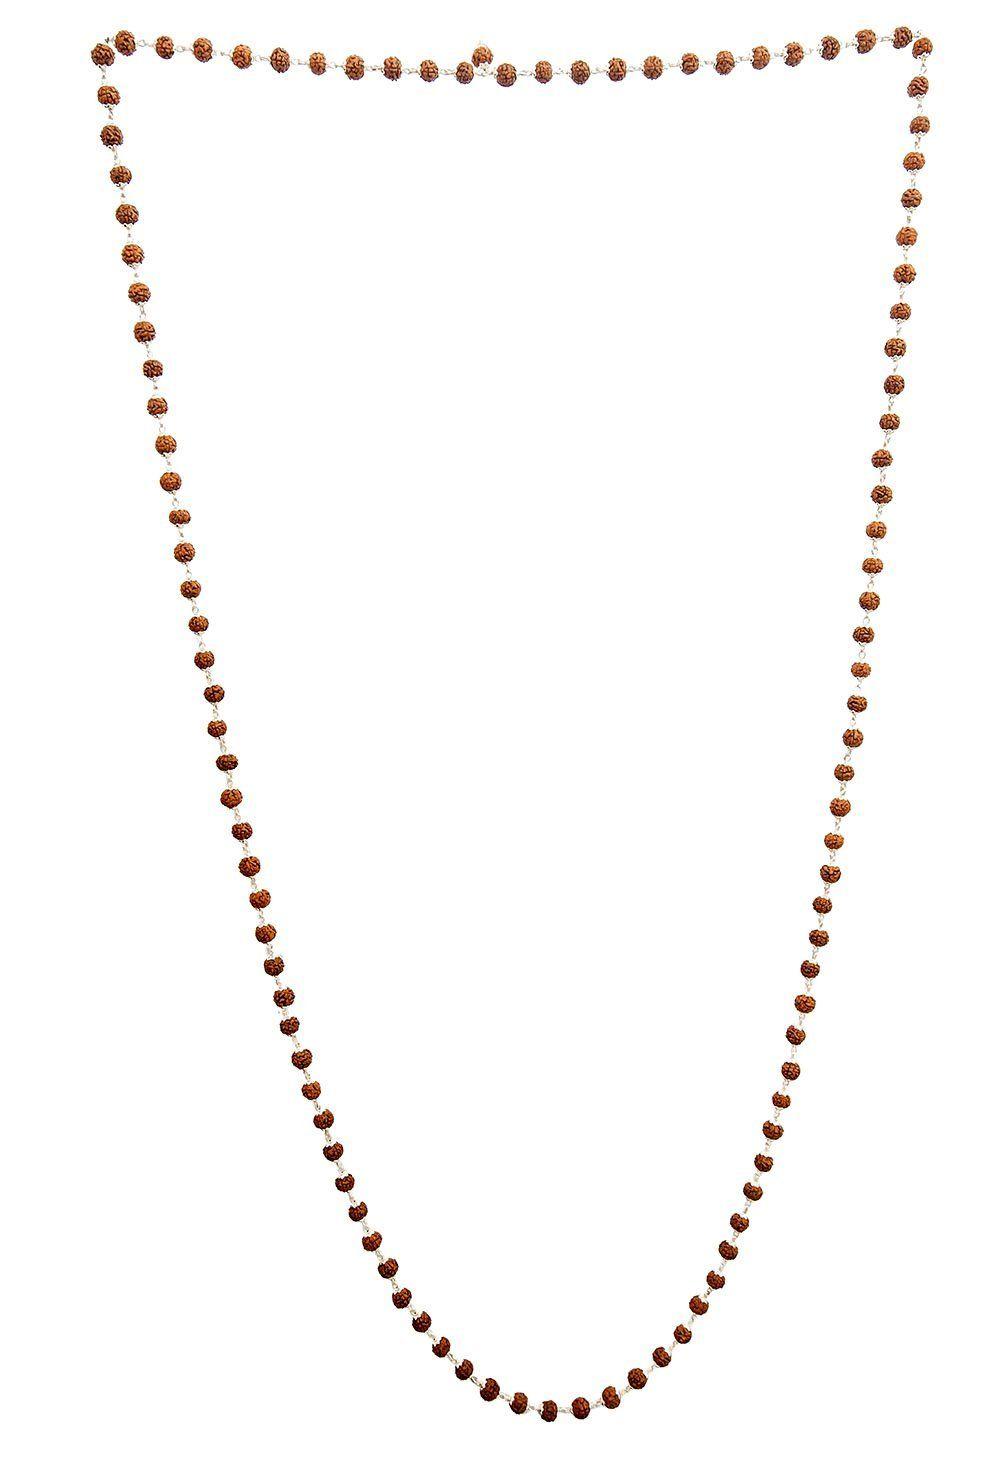 Rudraksha mala rosary beads for chanting sterling silver